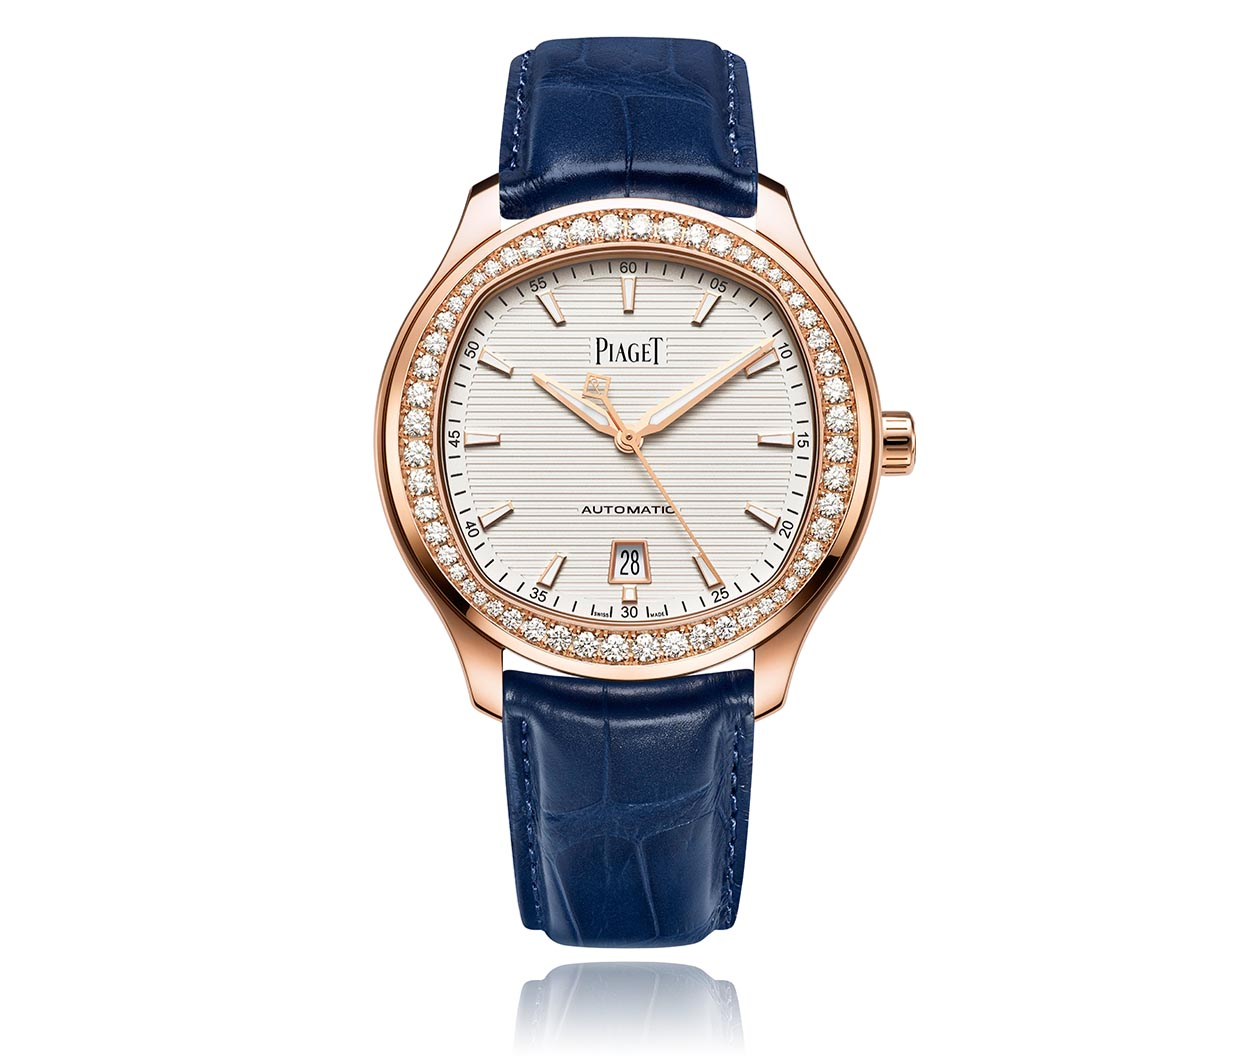 Piaget Polo watch G0A44010 Carousel 1 FINAL